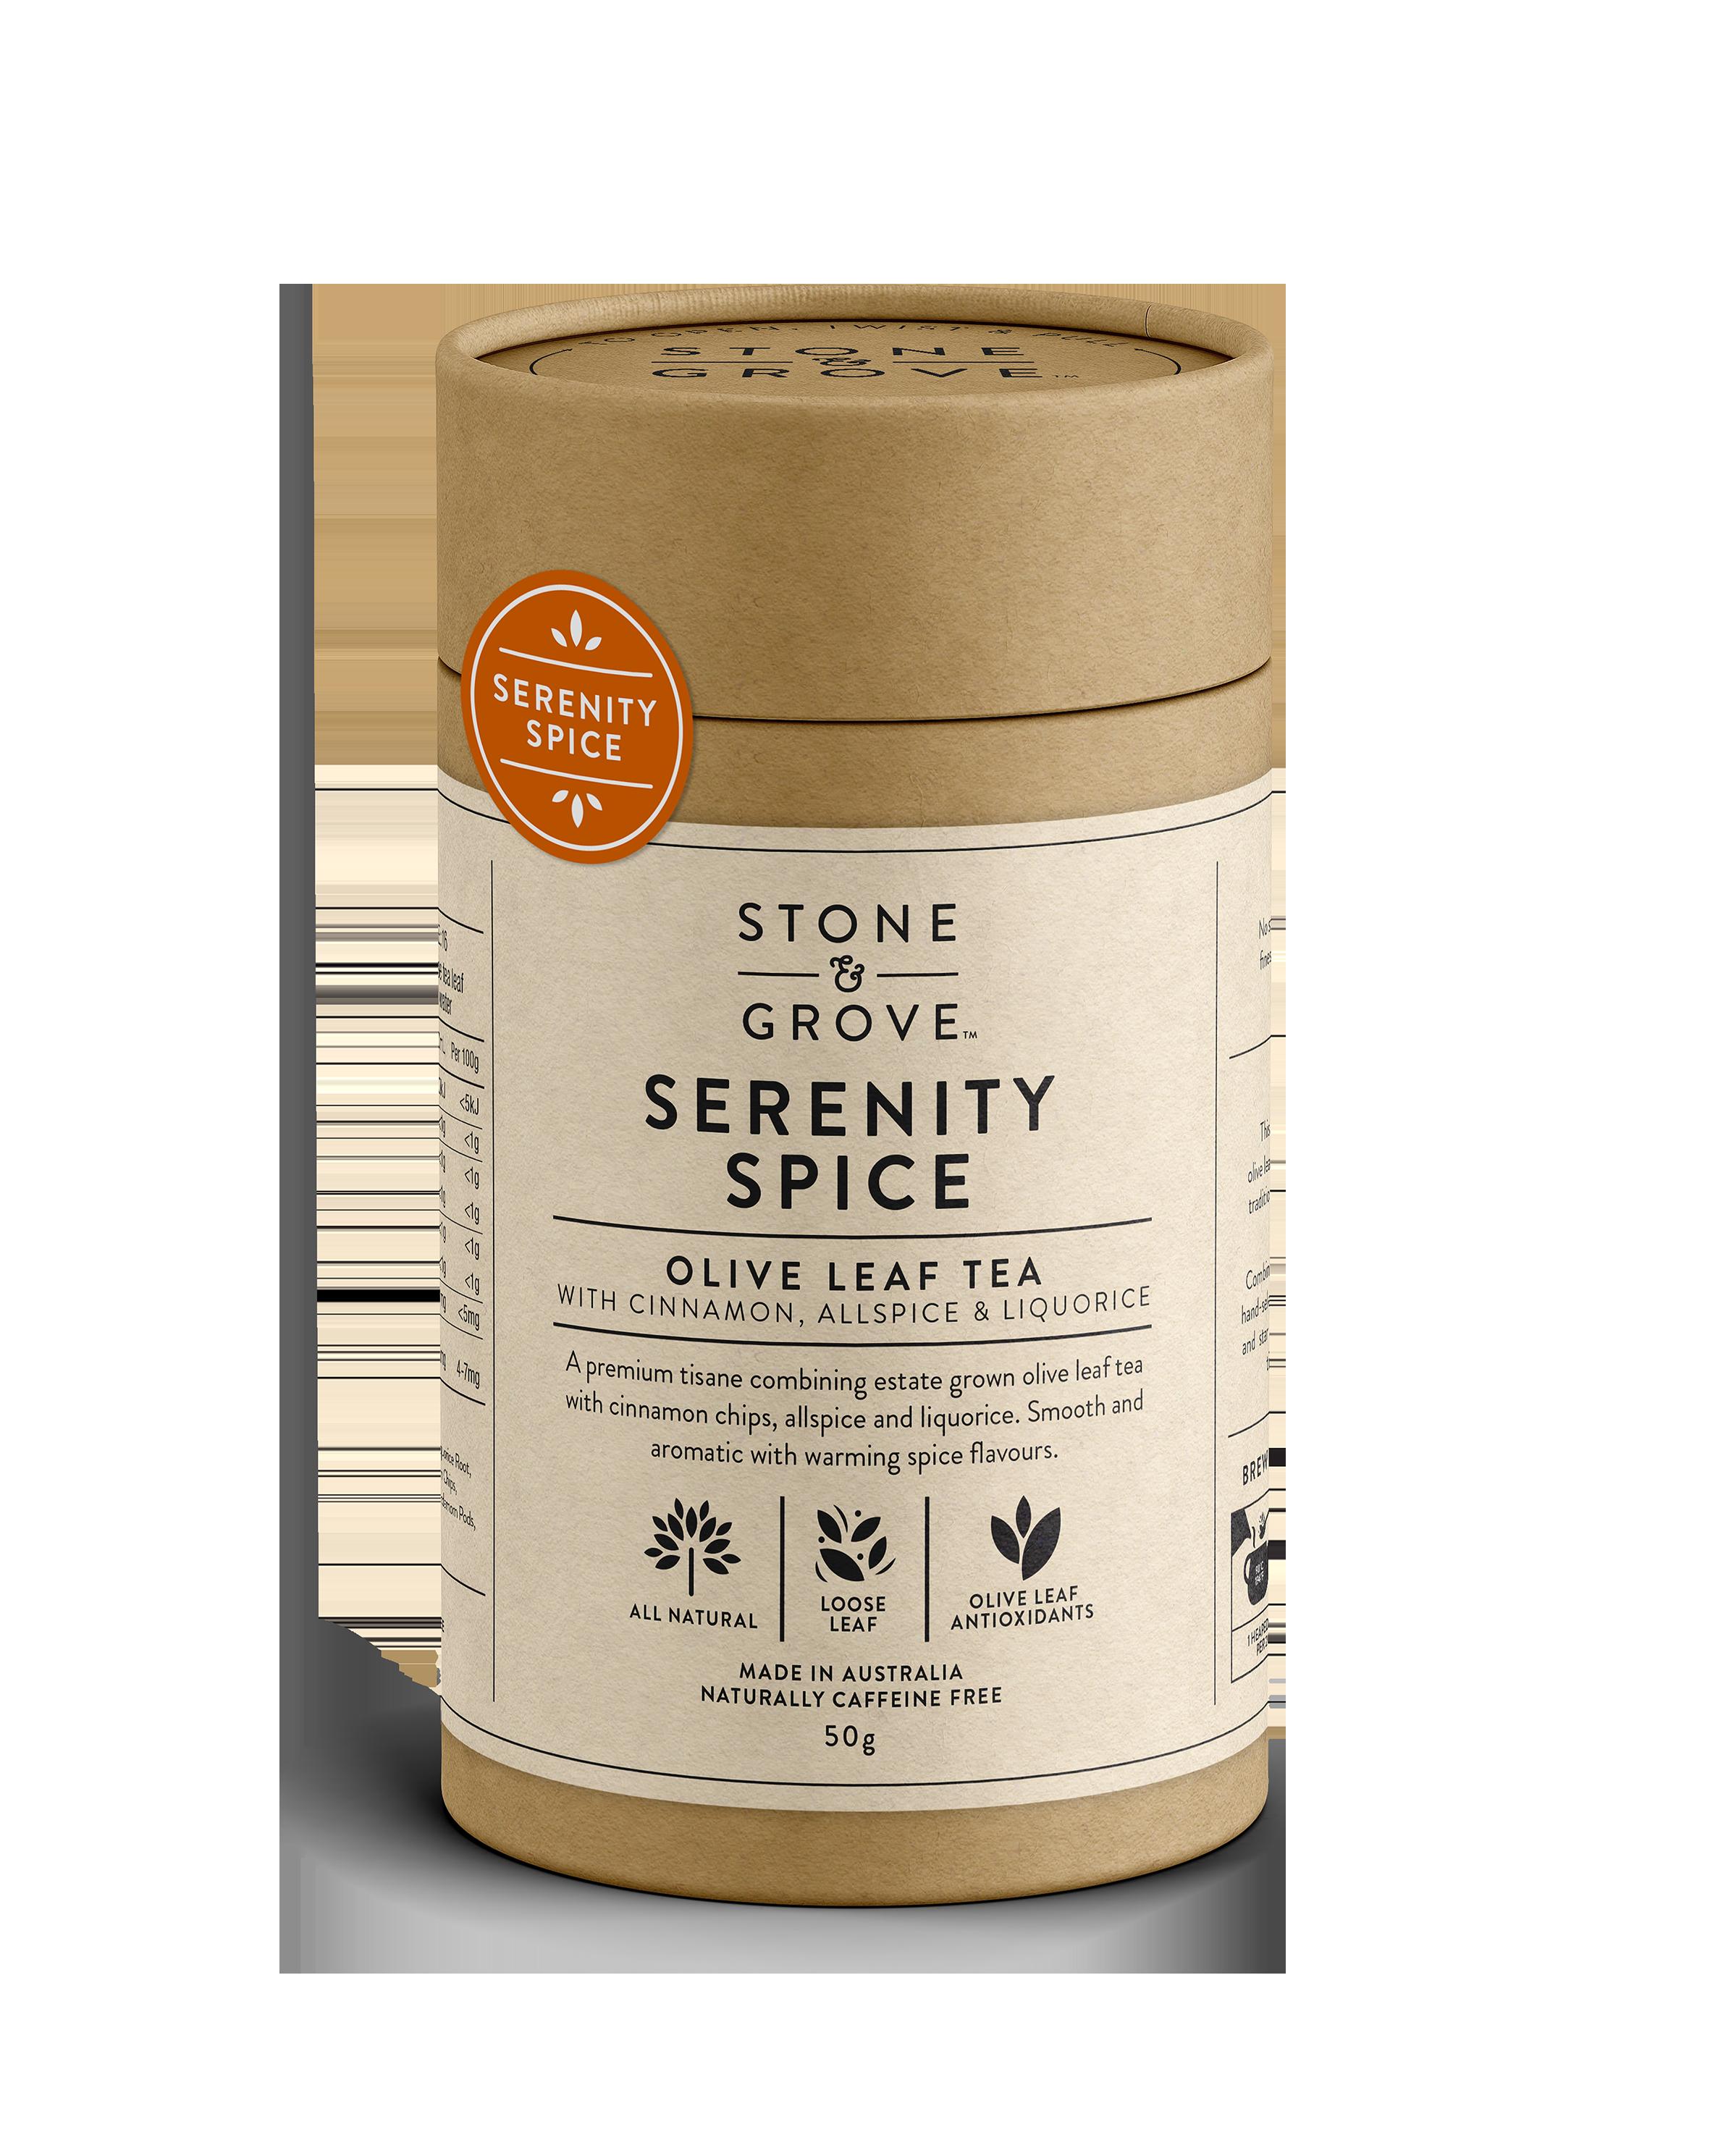 BBW Stone Grove OLT Serenity Spice